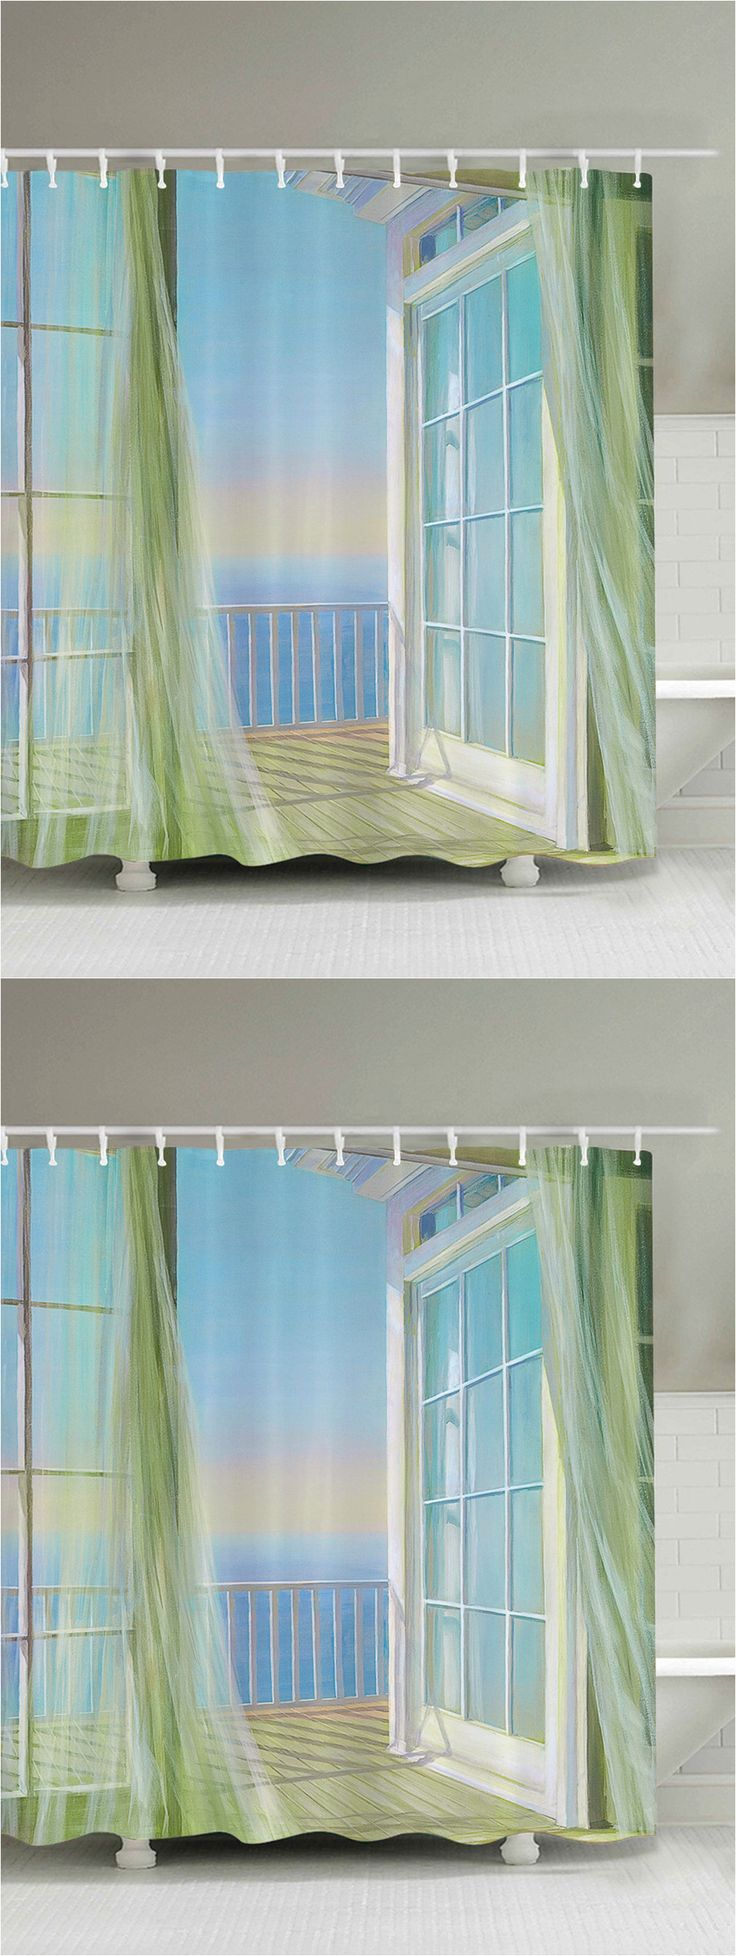 $20.47 Bath Decor Balcony Seascape Shower Curtain - White